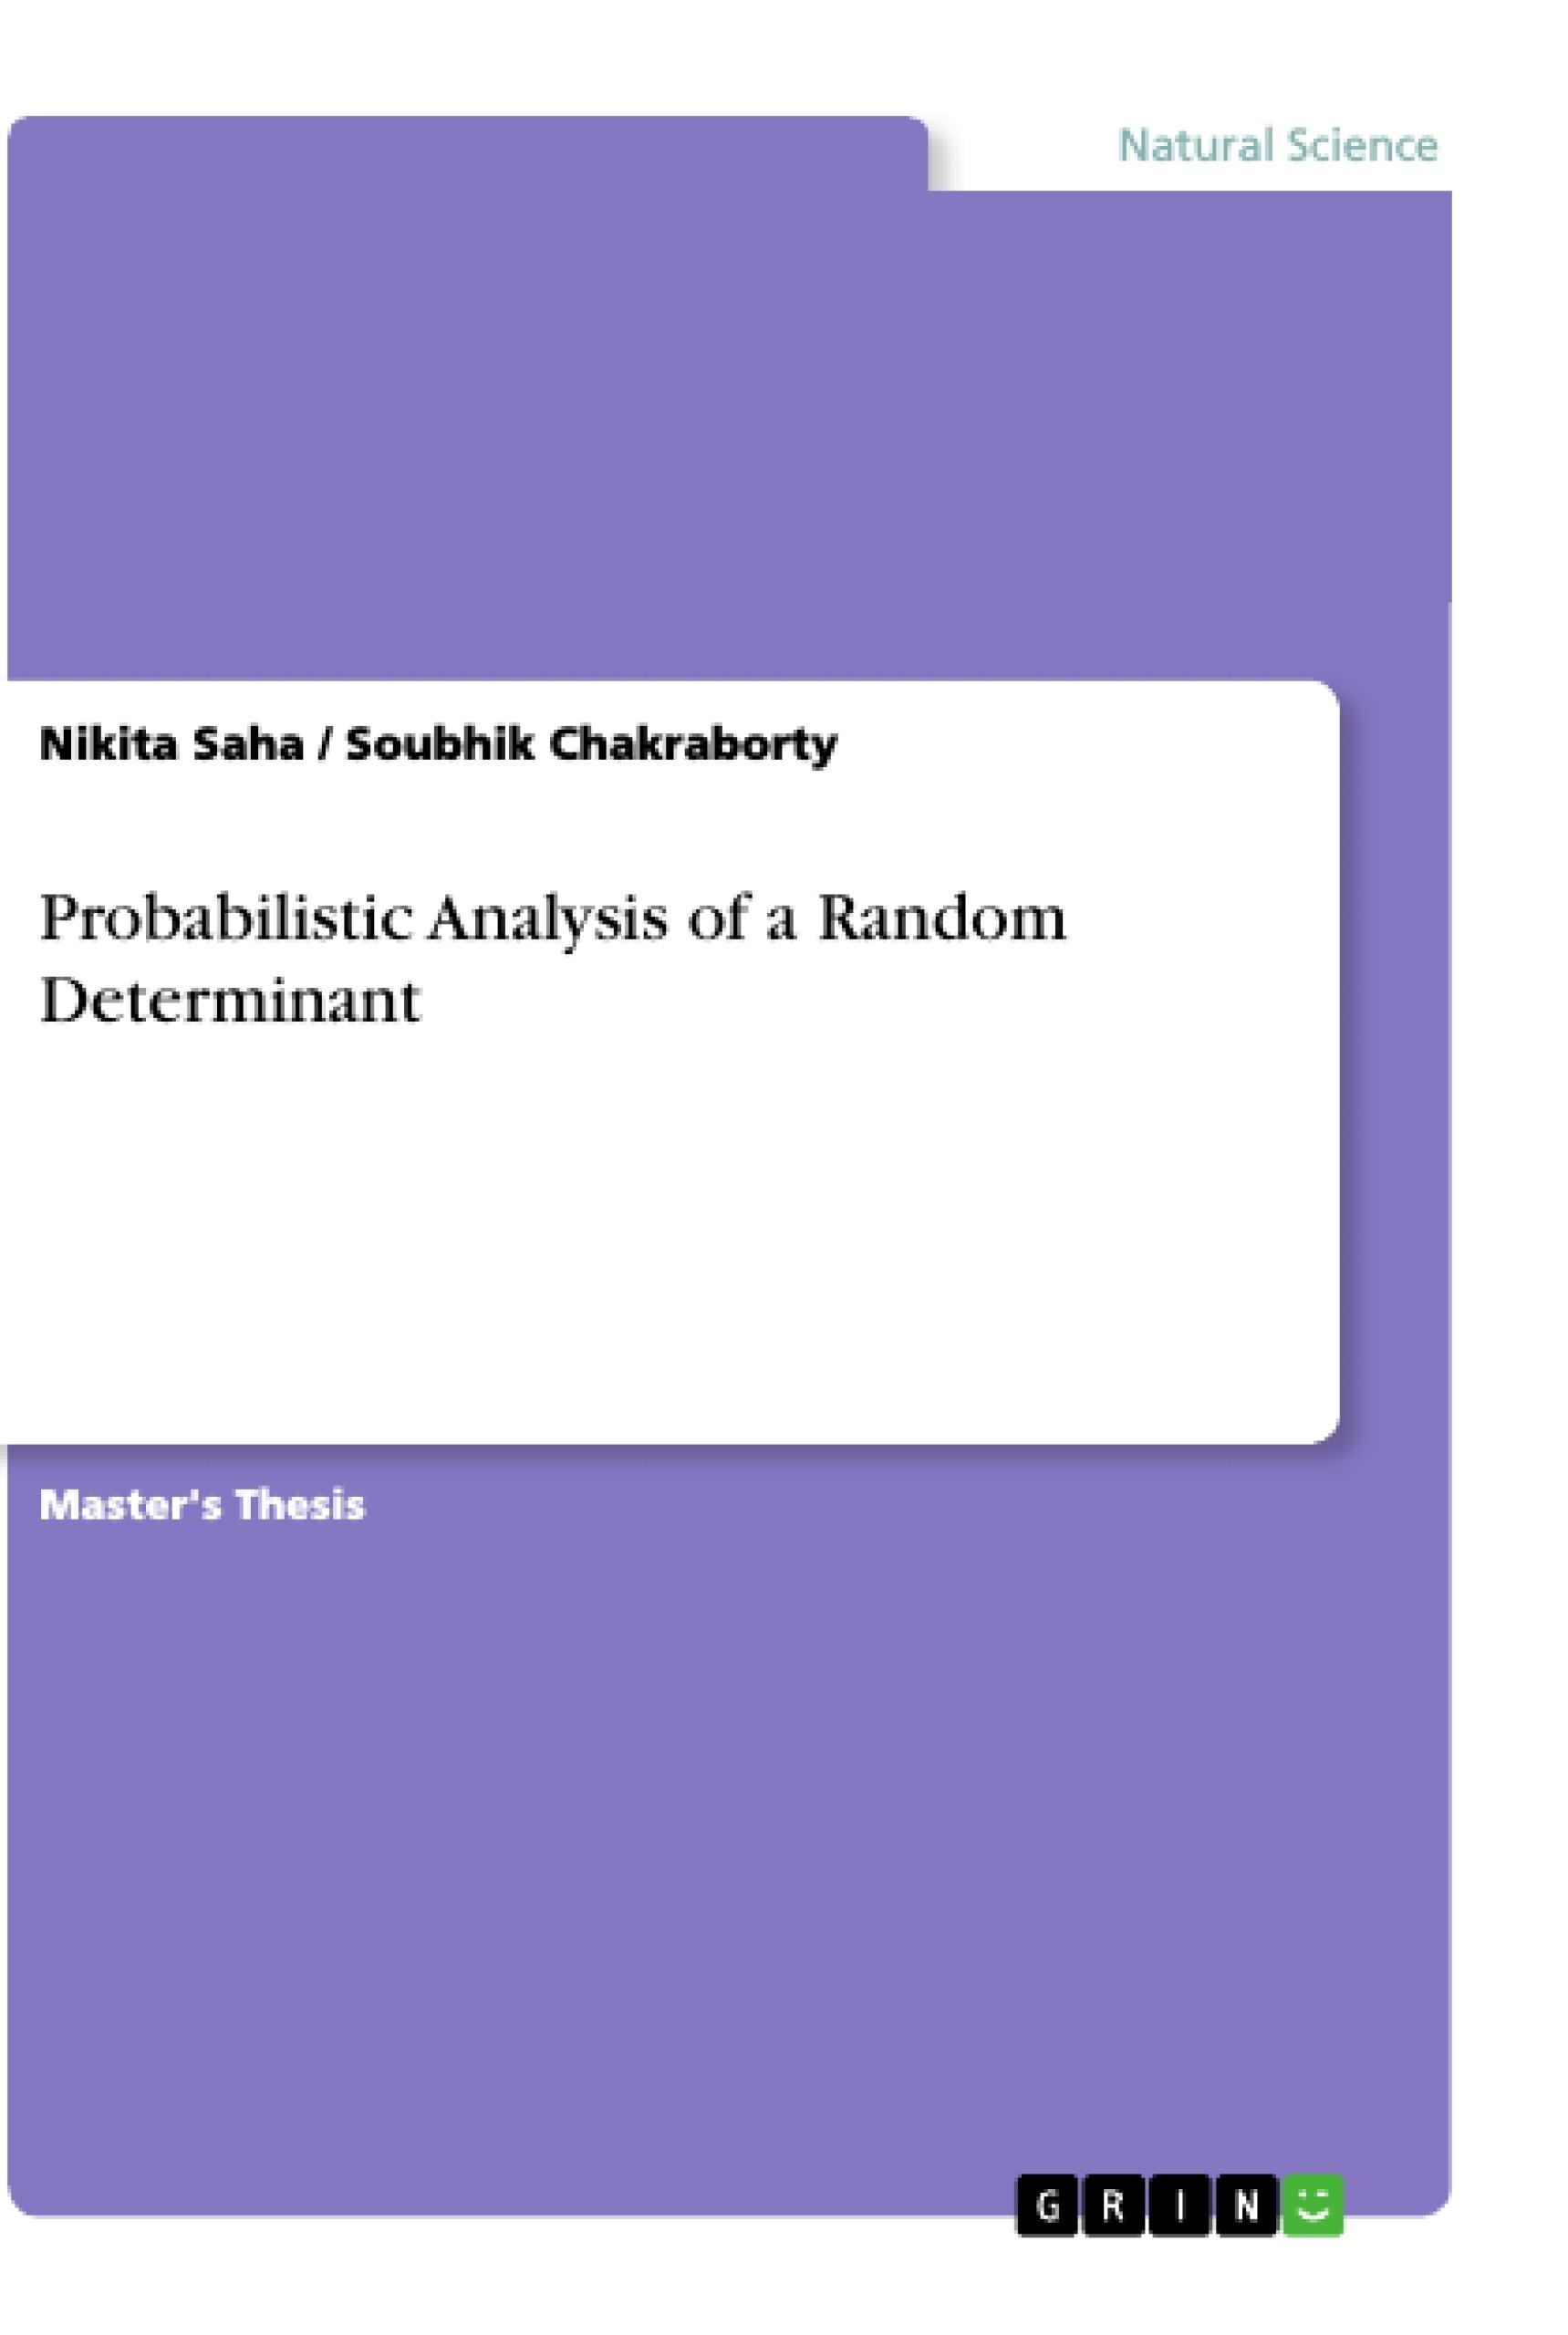 Title: Probabilistic Analysis of a Random Determinant